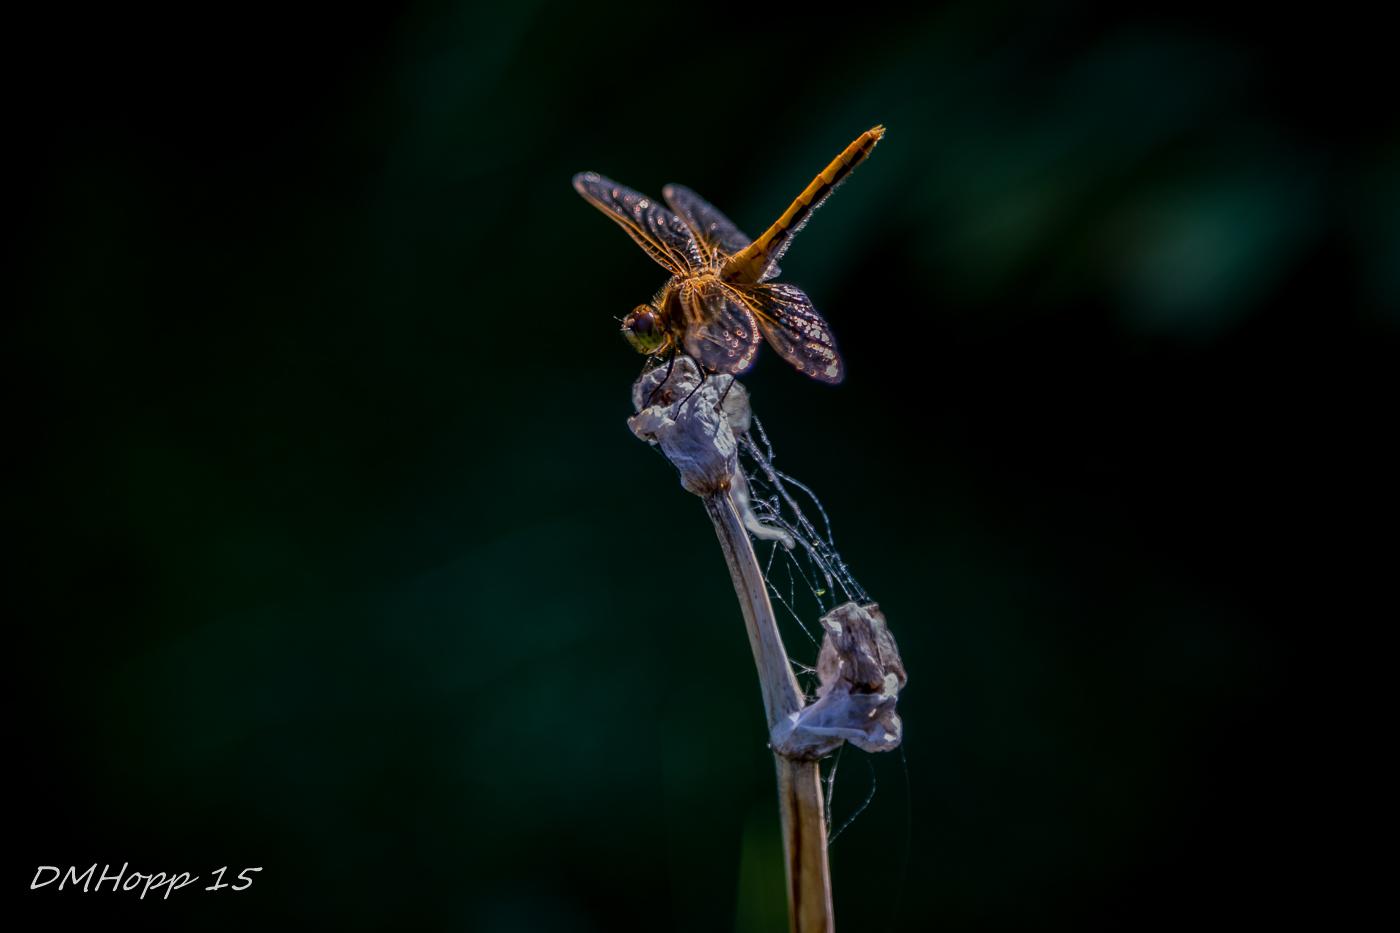 Dragonfly on Iris - DMHopp